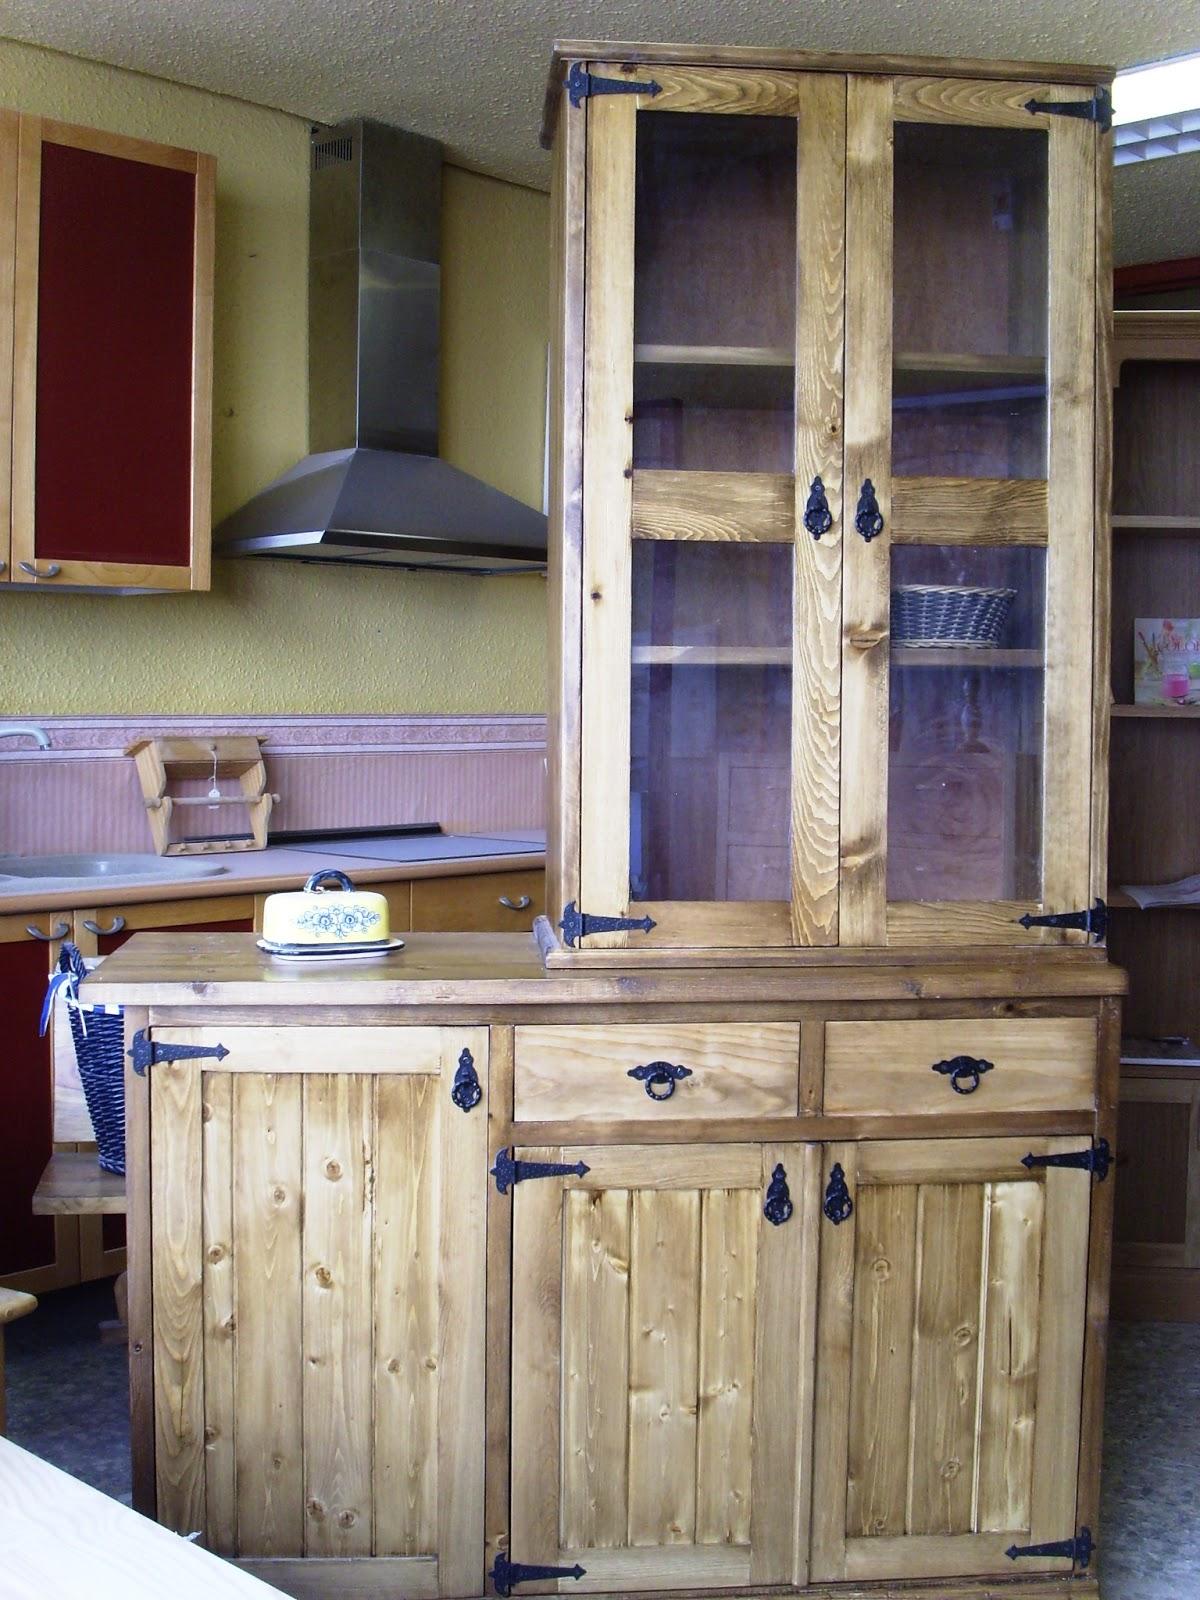 Decoracion de interiores restauracion de antiguedades y for Decoracion de interiores 0